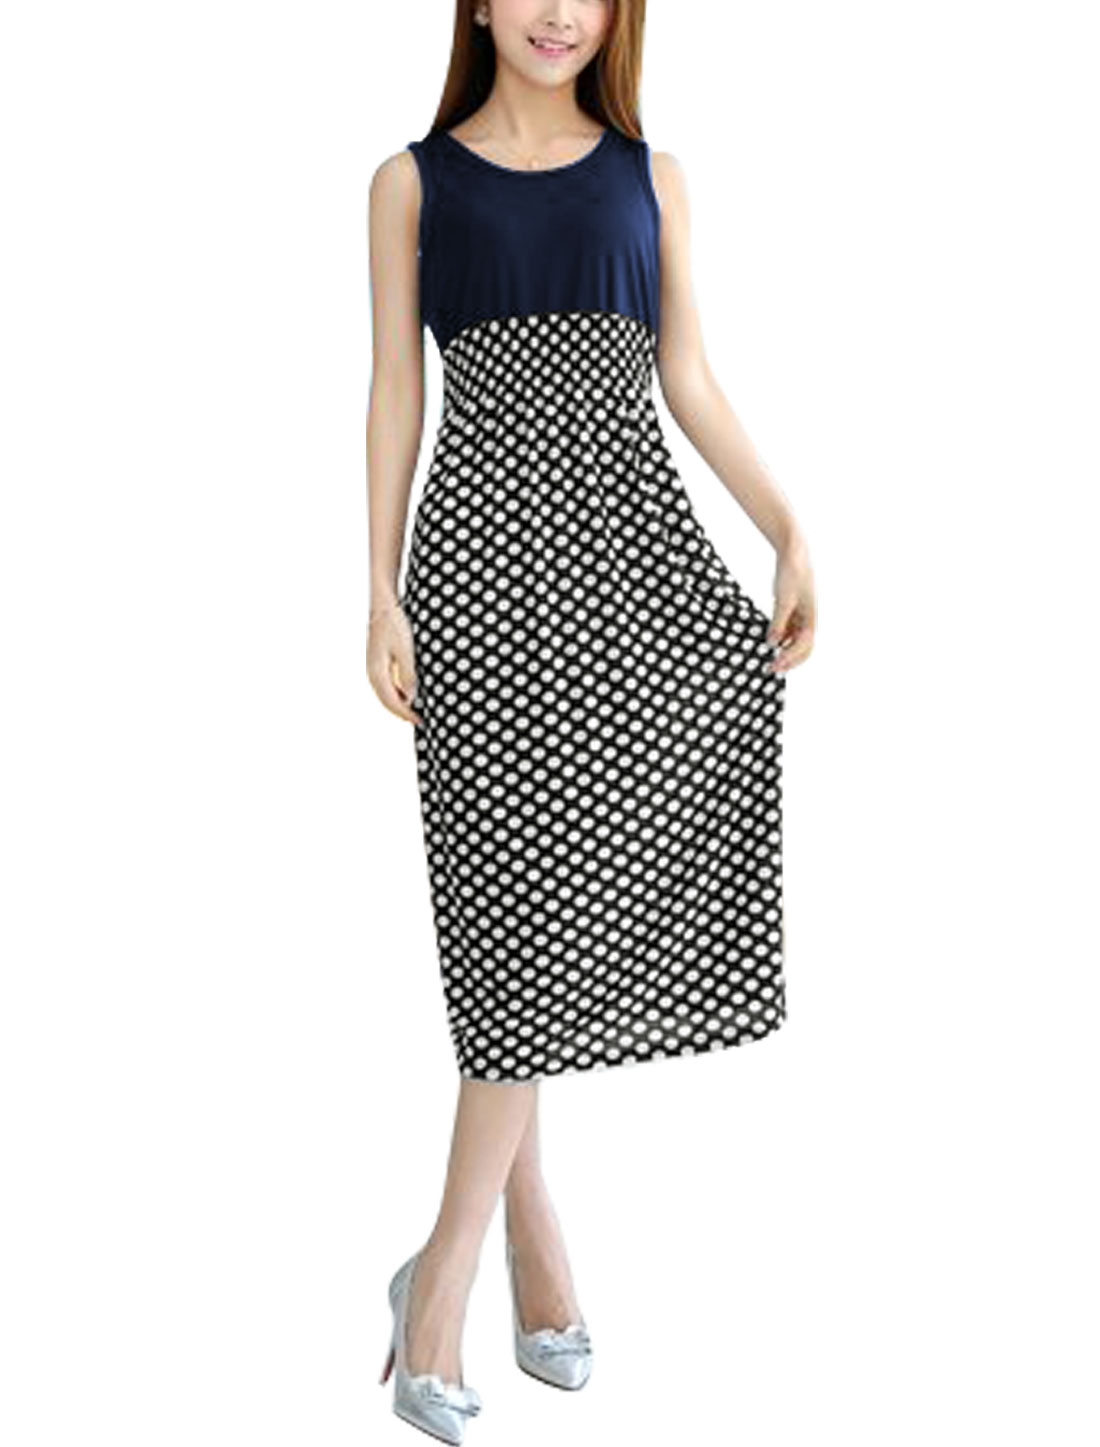 Women Sleeveless Dots Prints Smocked Waist Unlined Midi Dress Navy Blue Black XS